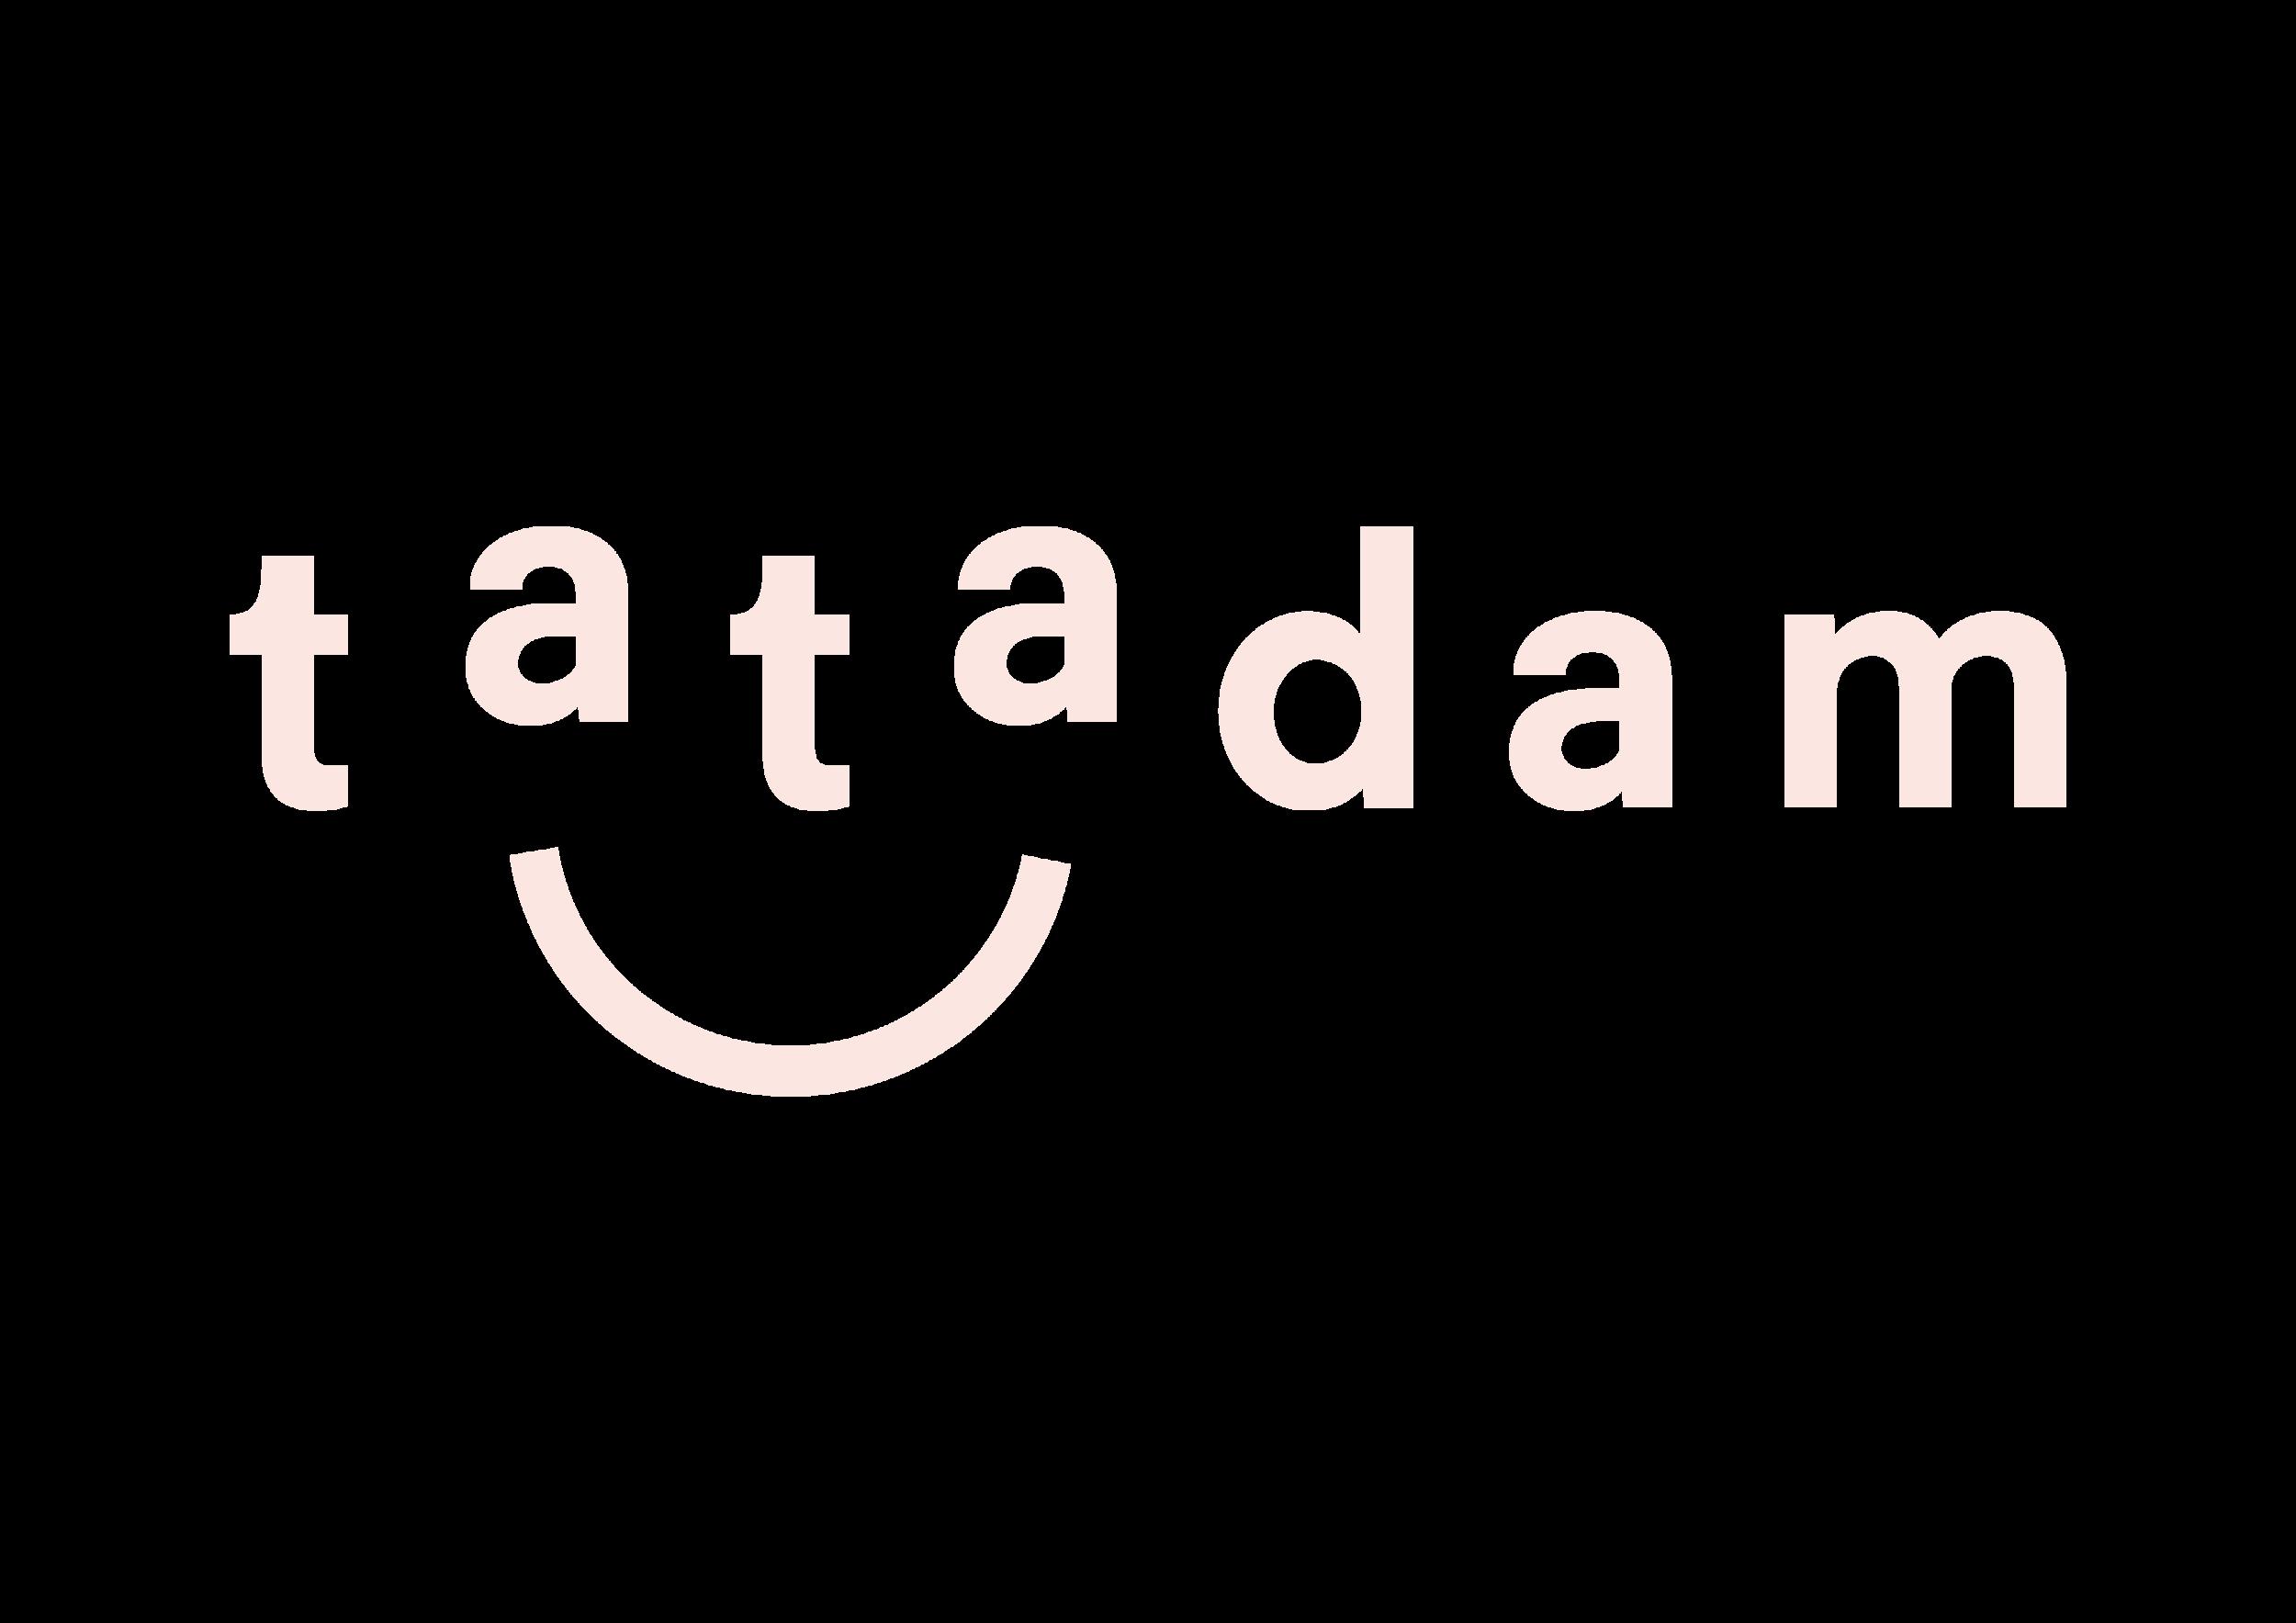 TADADAM_LOGO_ROSE.png